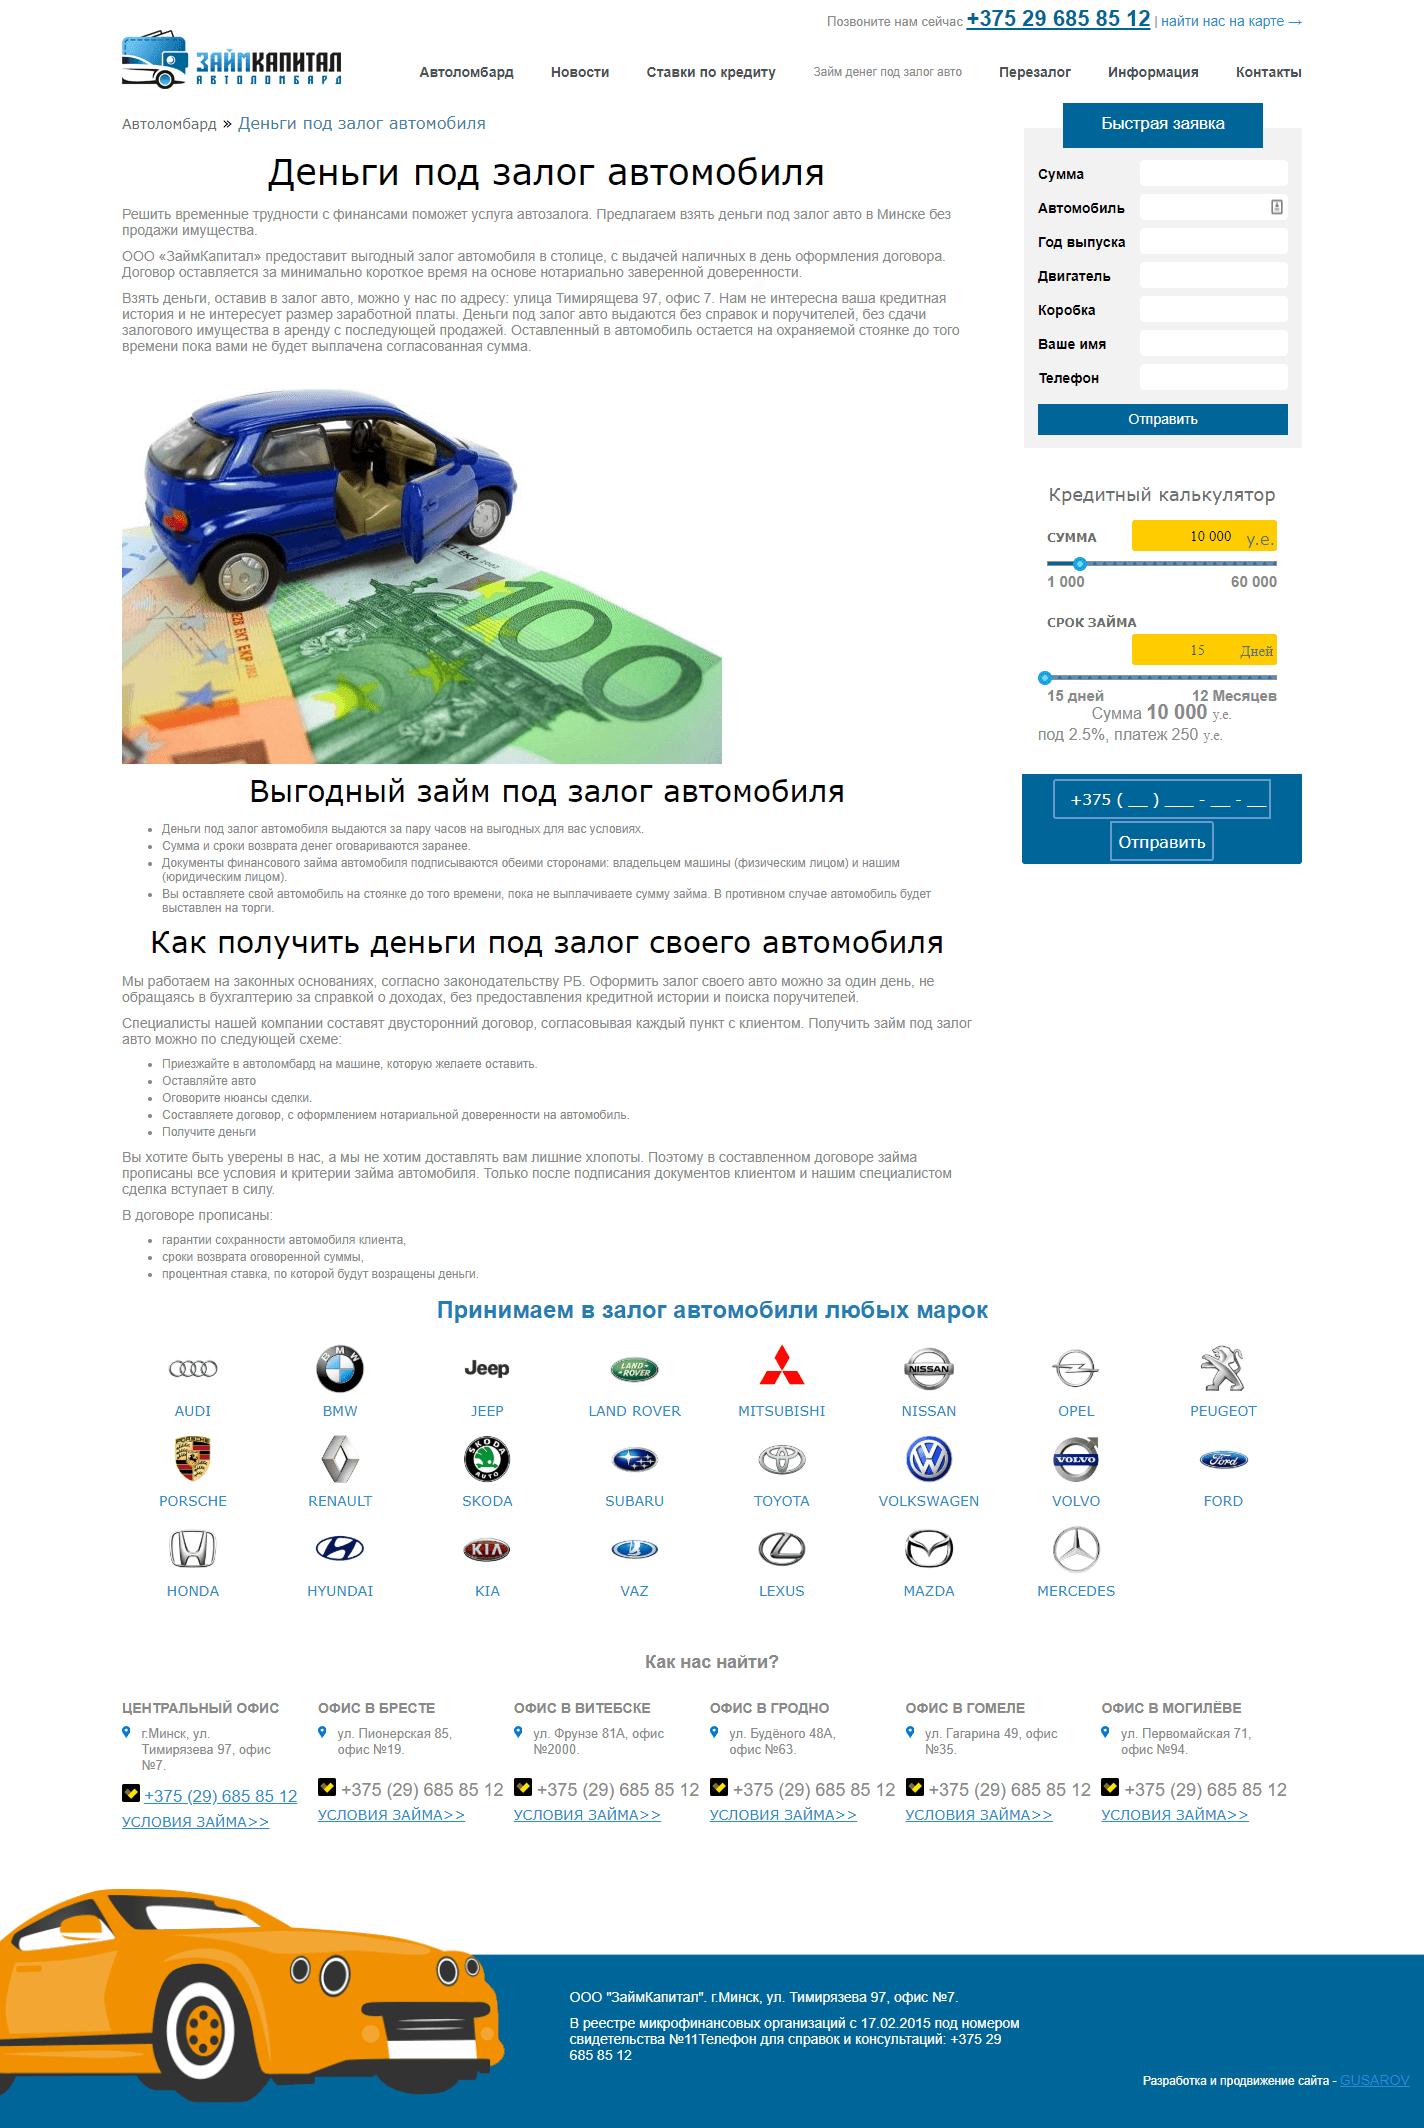 Займ денег под залог авто